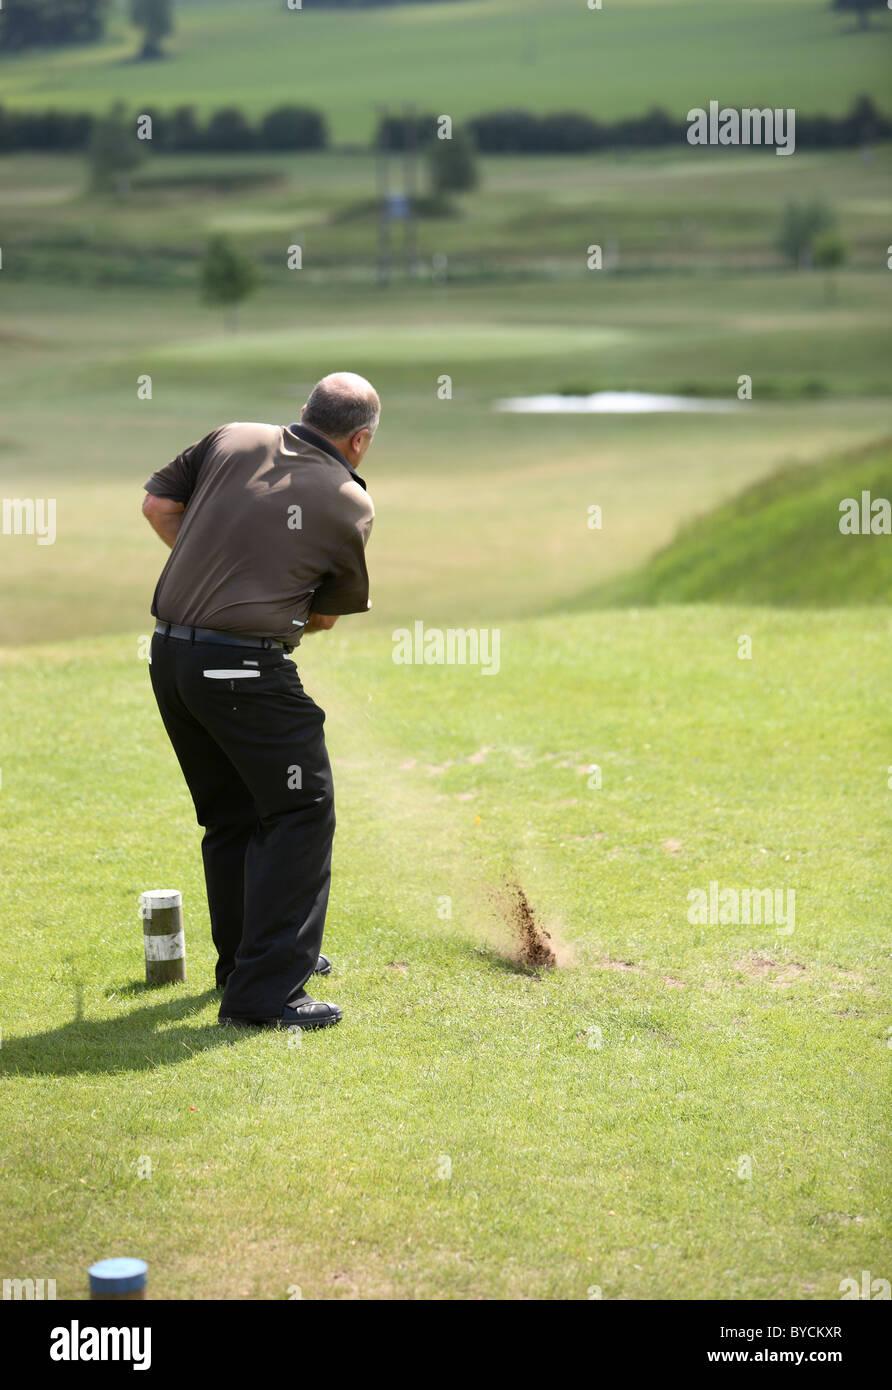 Golfer in brown shirt teeing off down fairway - Stock Image